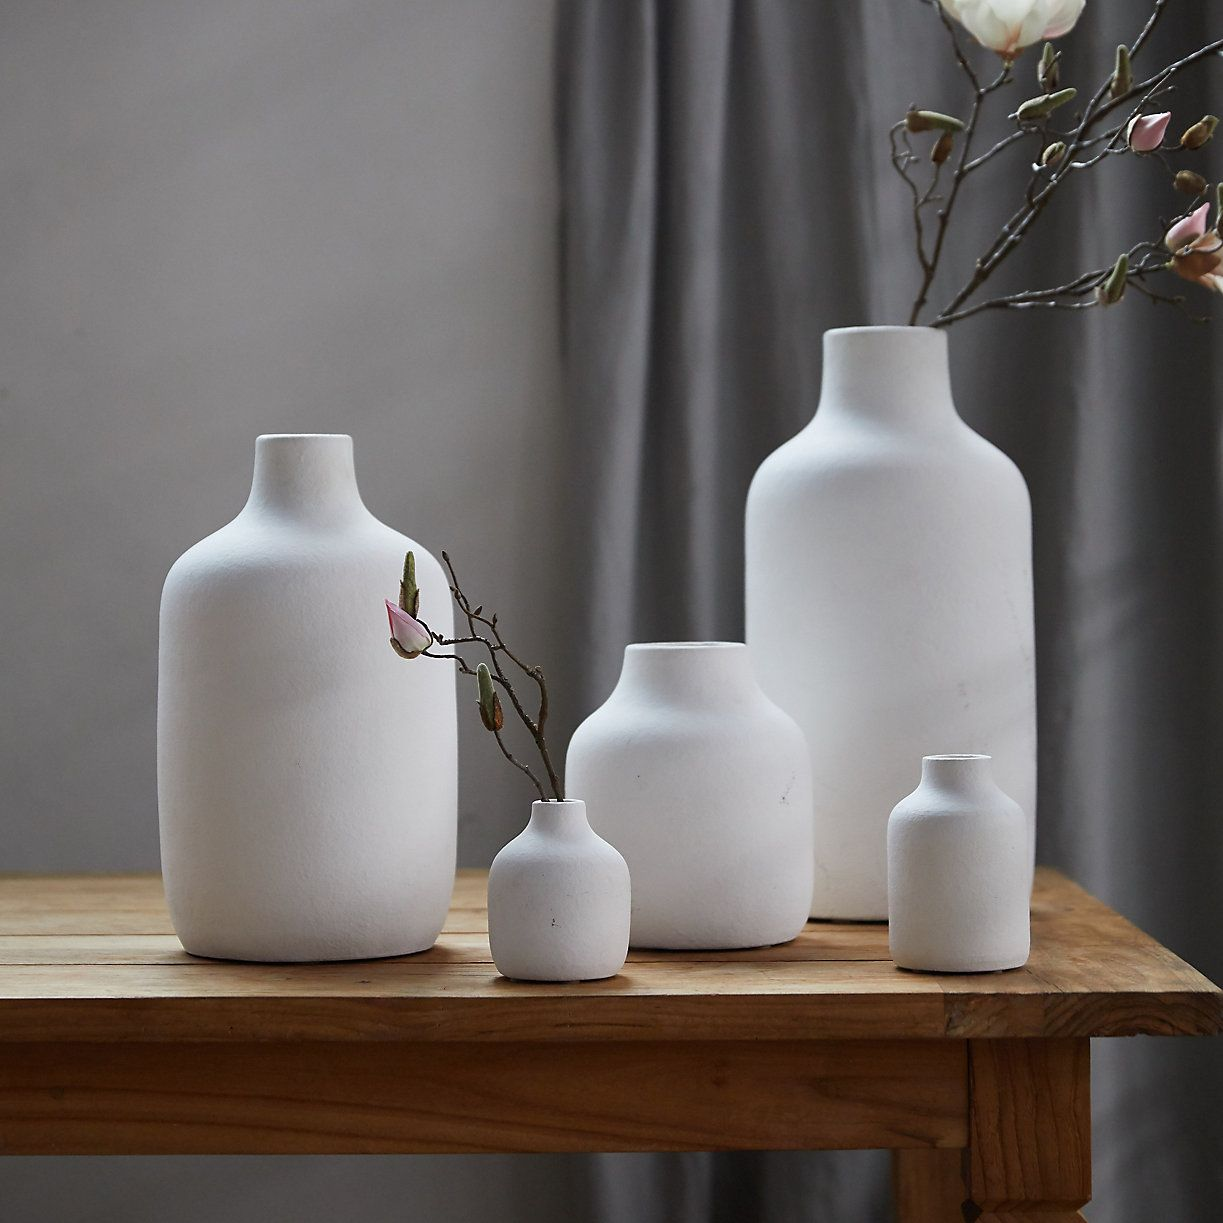 Matte Terracotta Vase Wide Mouth Terrain White Vase Decor Large Ceramic Vase White Ceramic Vases